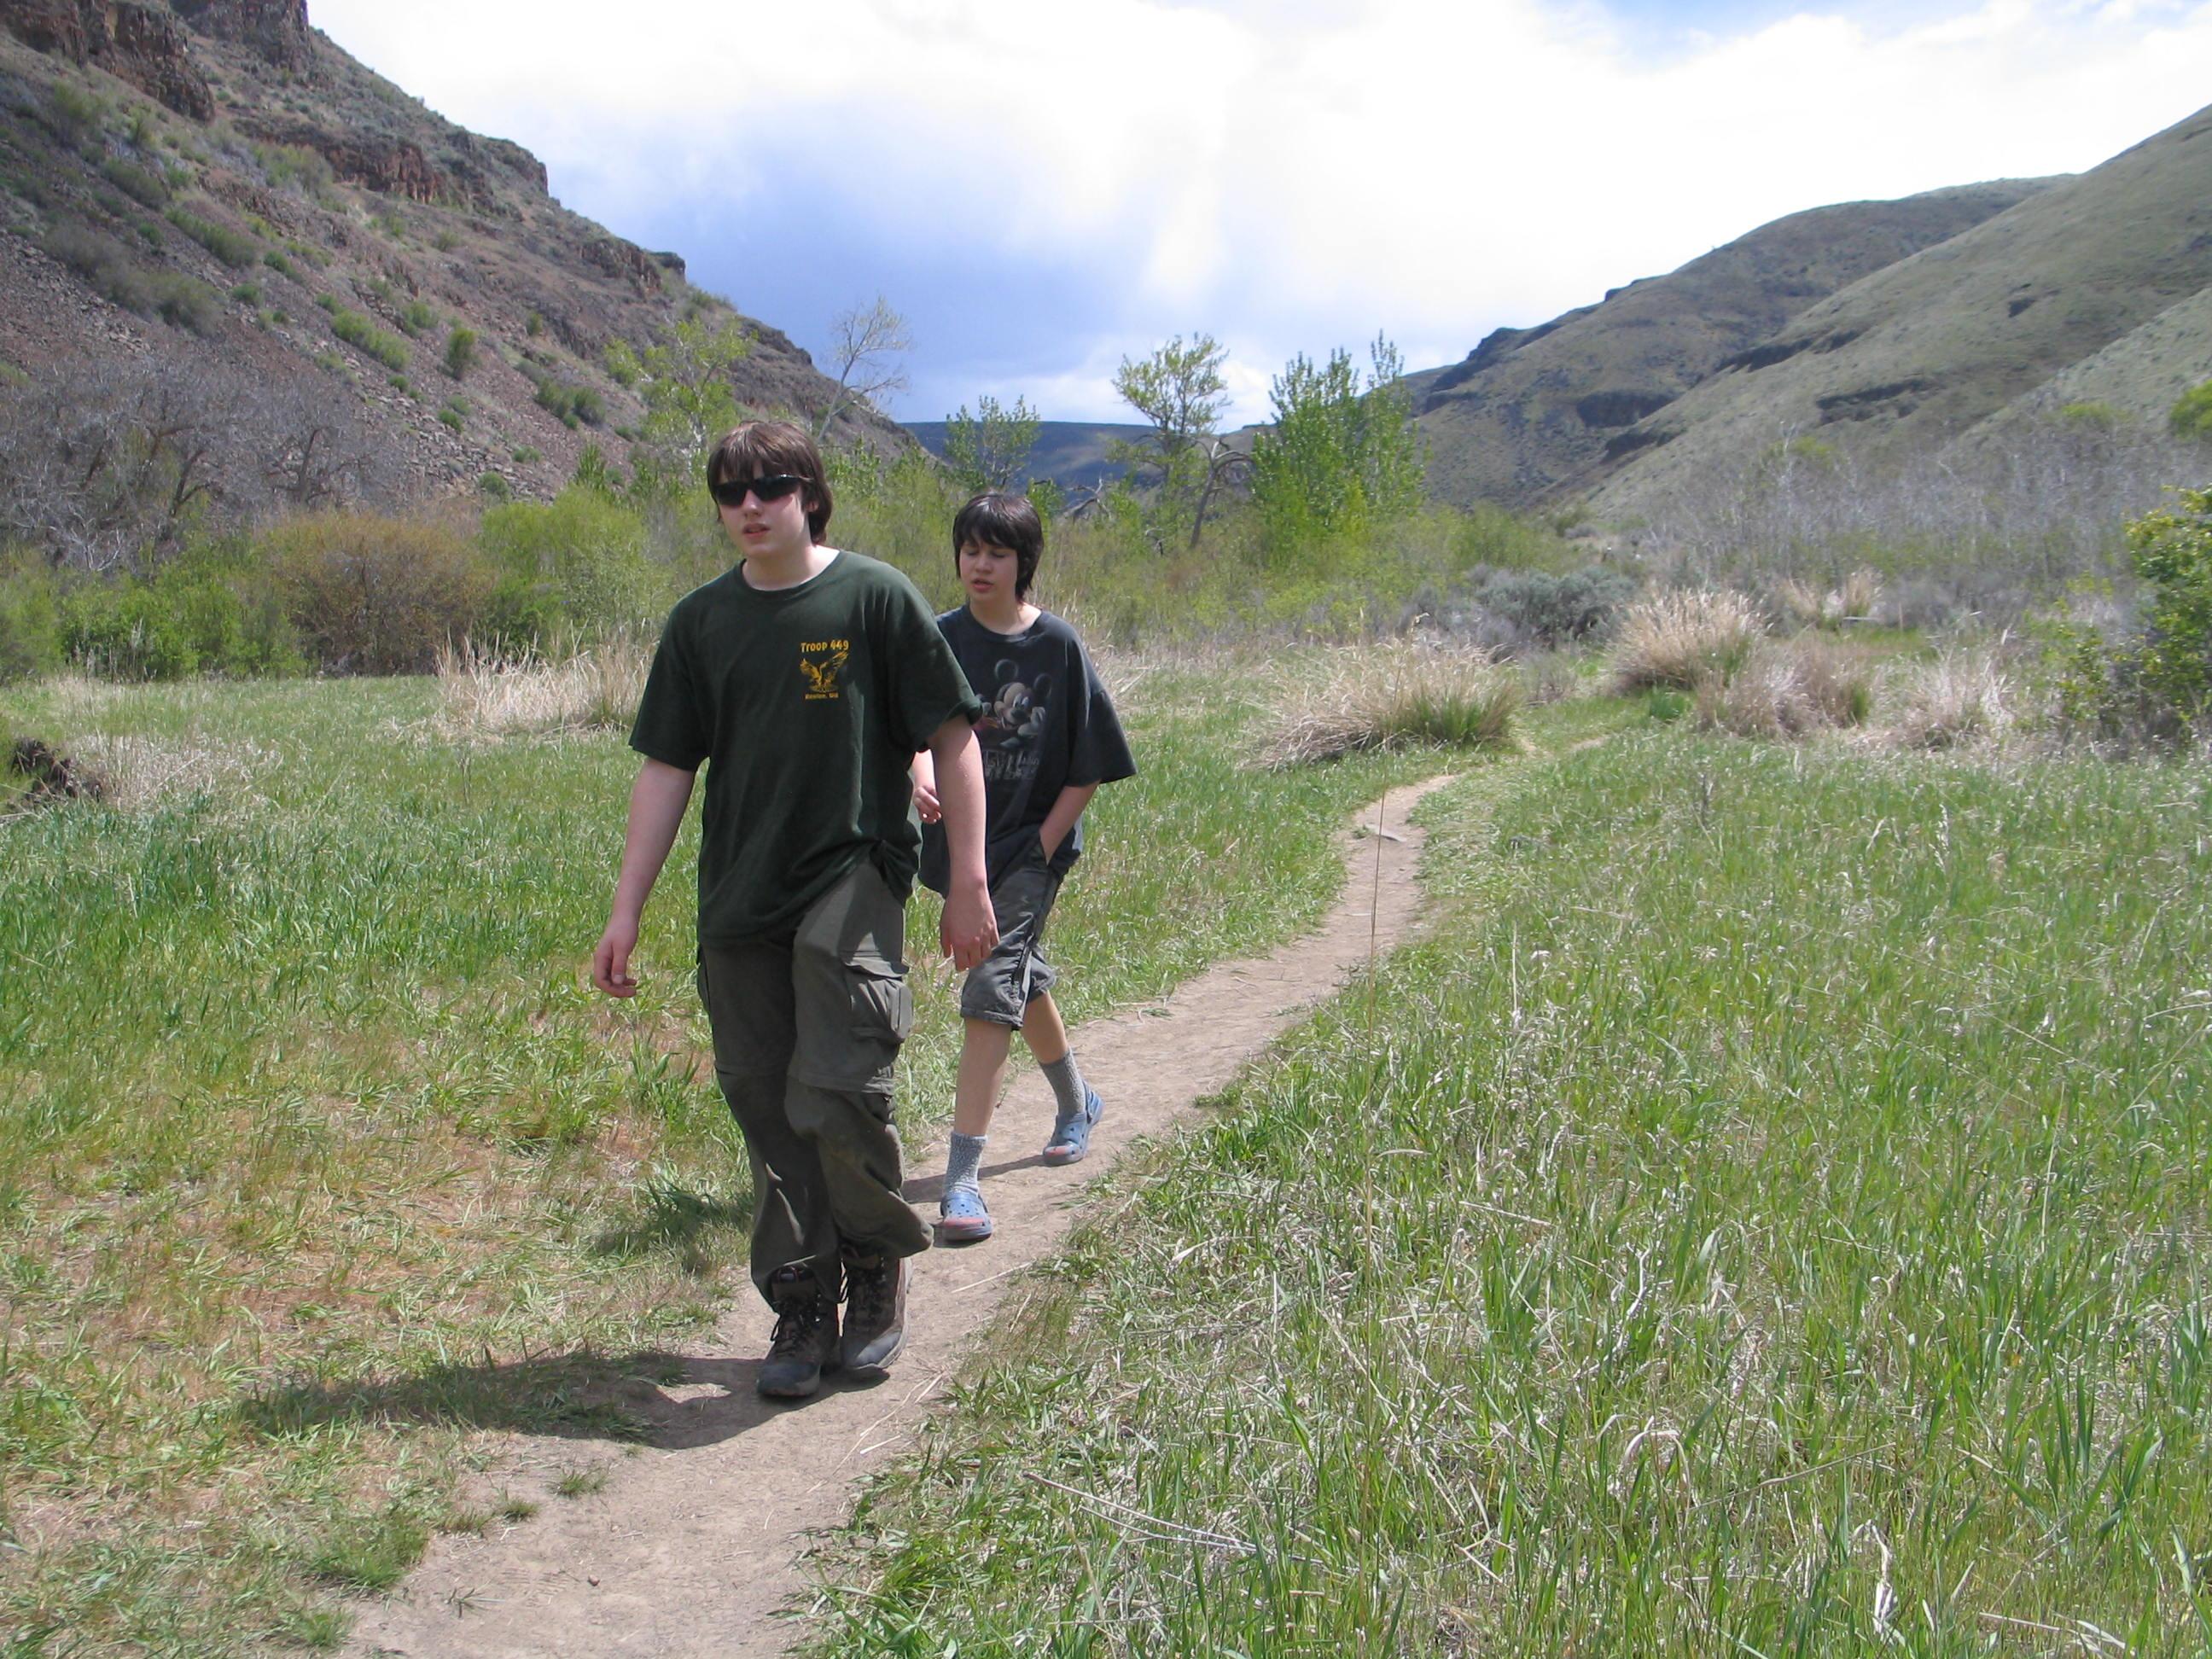 Umtanum Canyon trail boys 05-07-11 Raines 7697